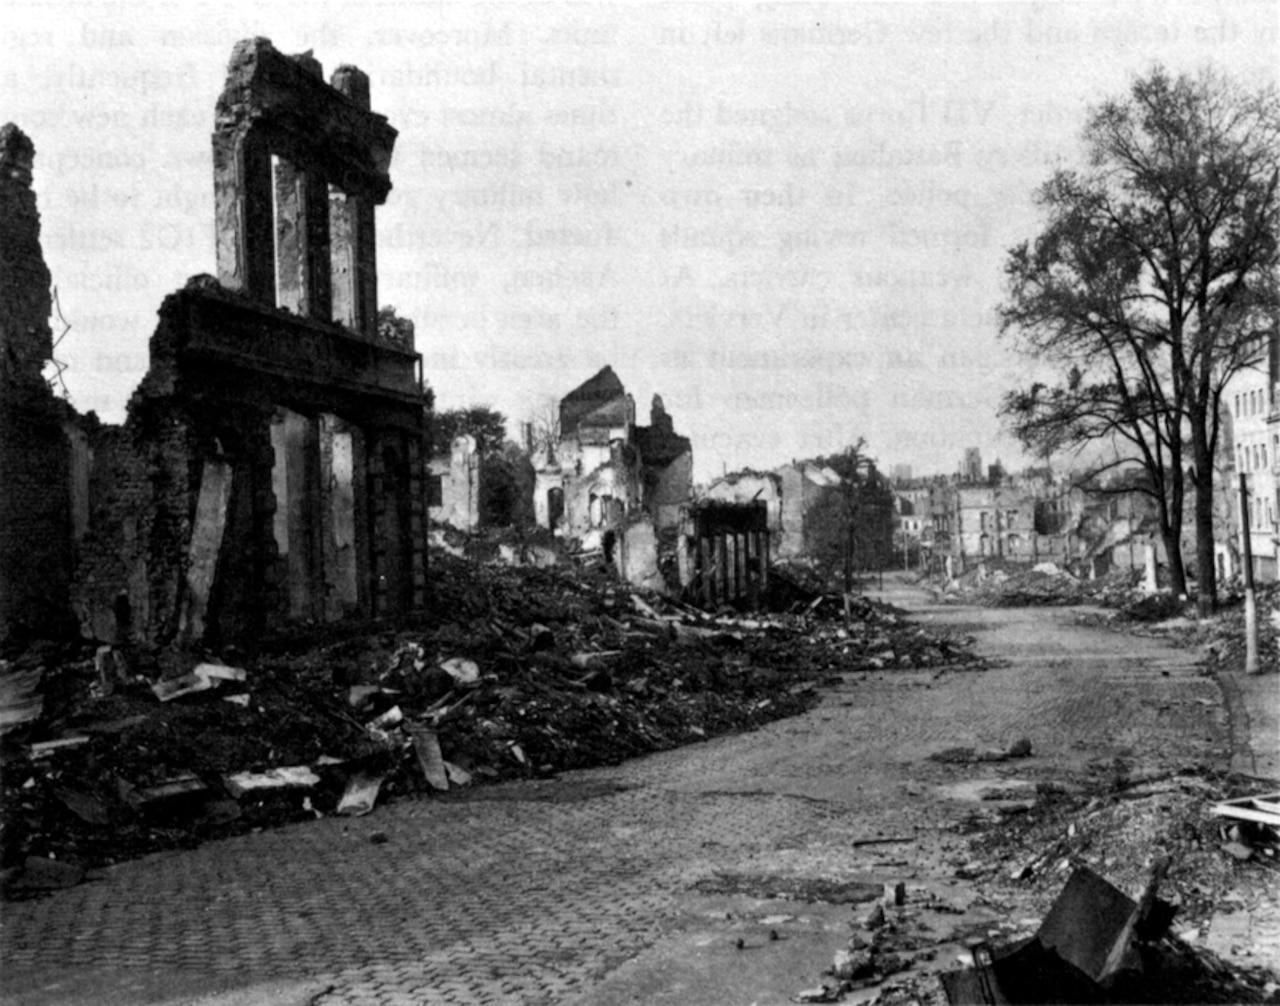 A street view of buildings in ruins.